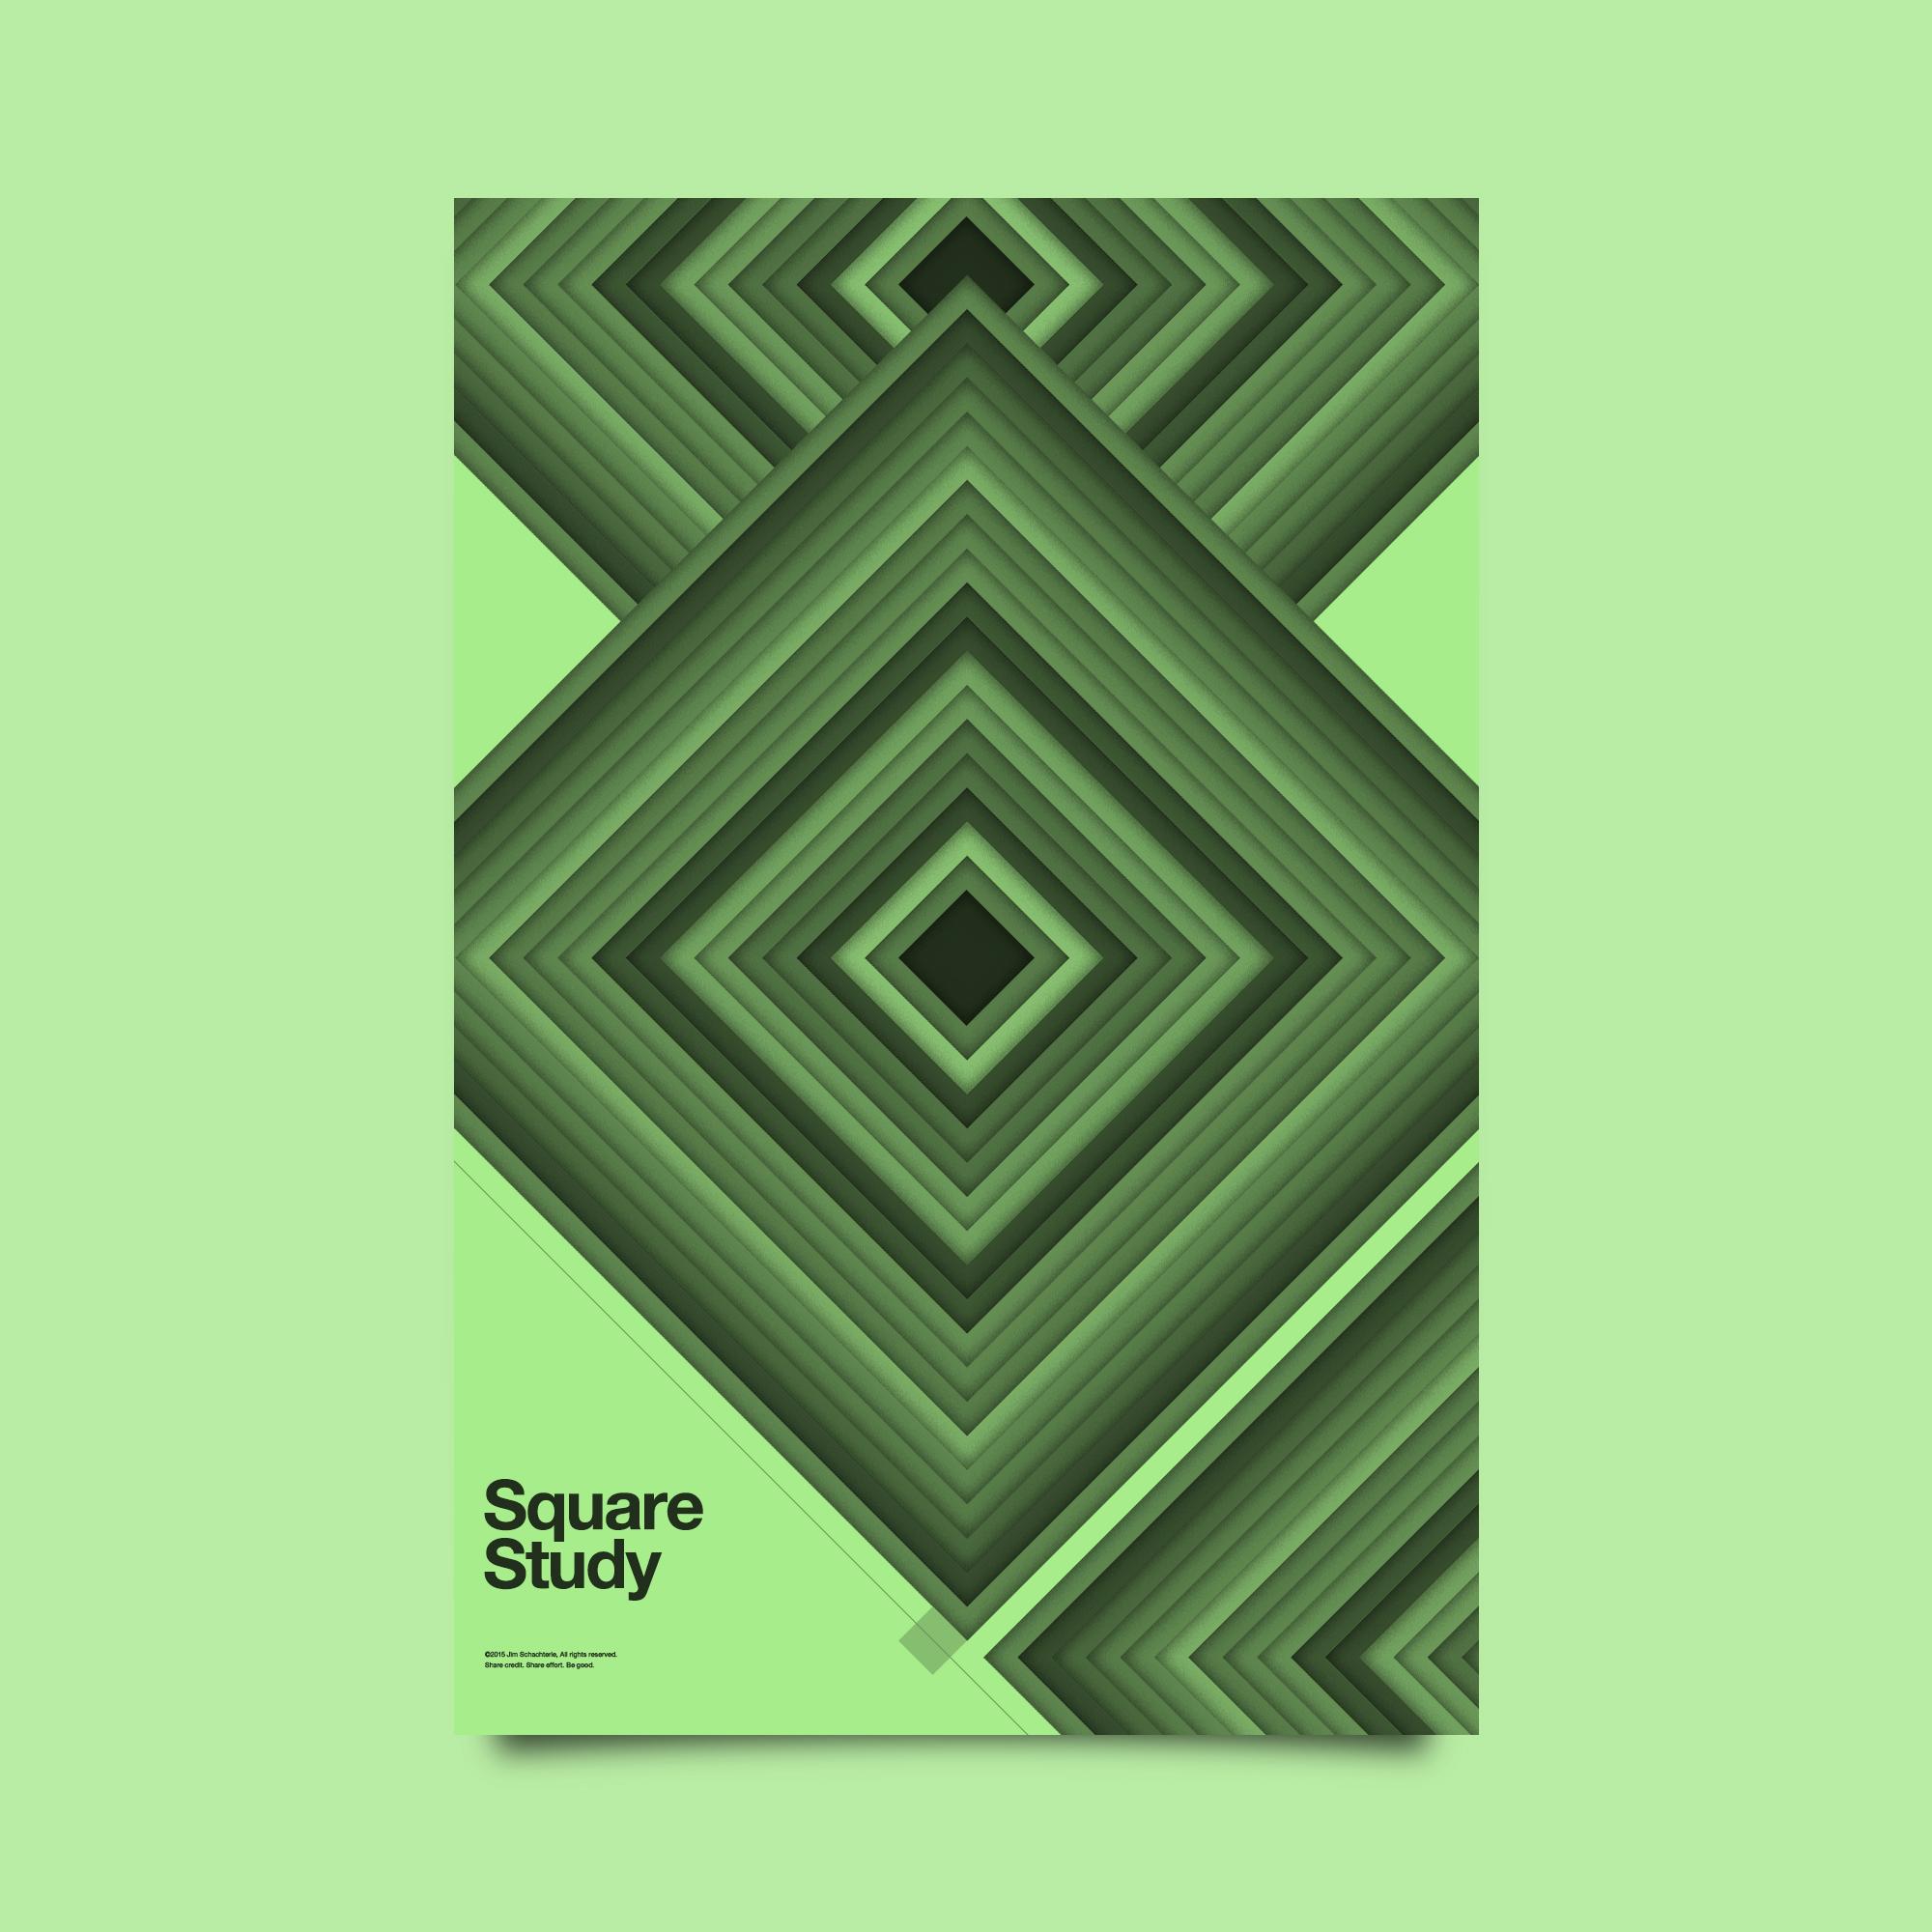 Square Study, Jim Schachterle